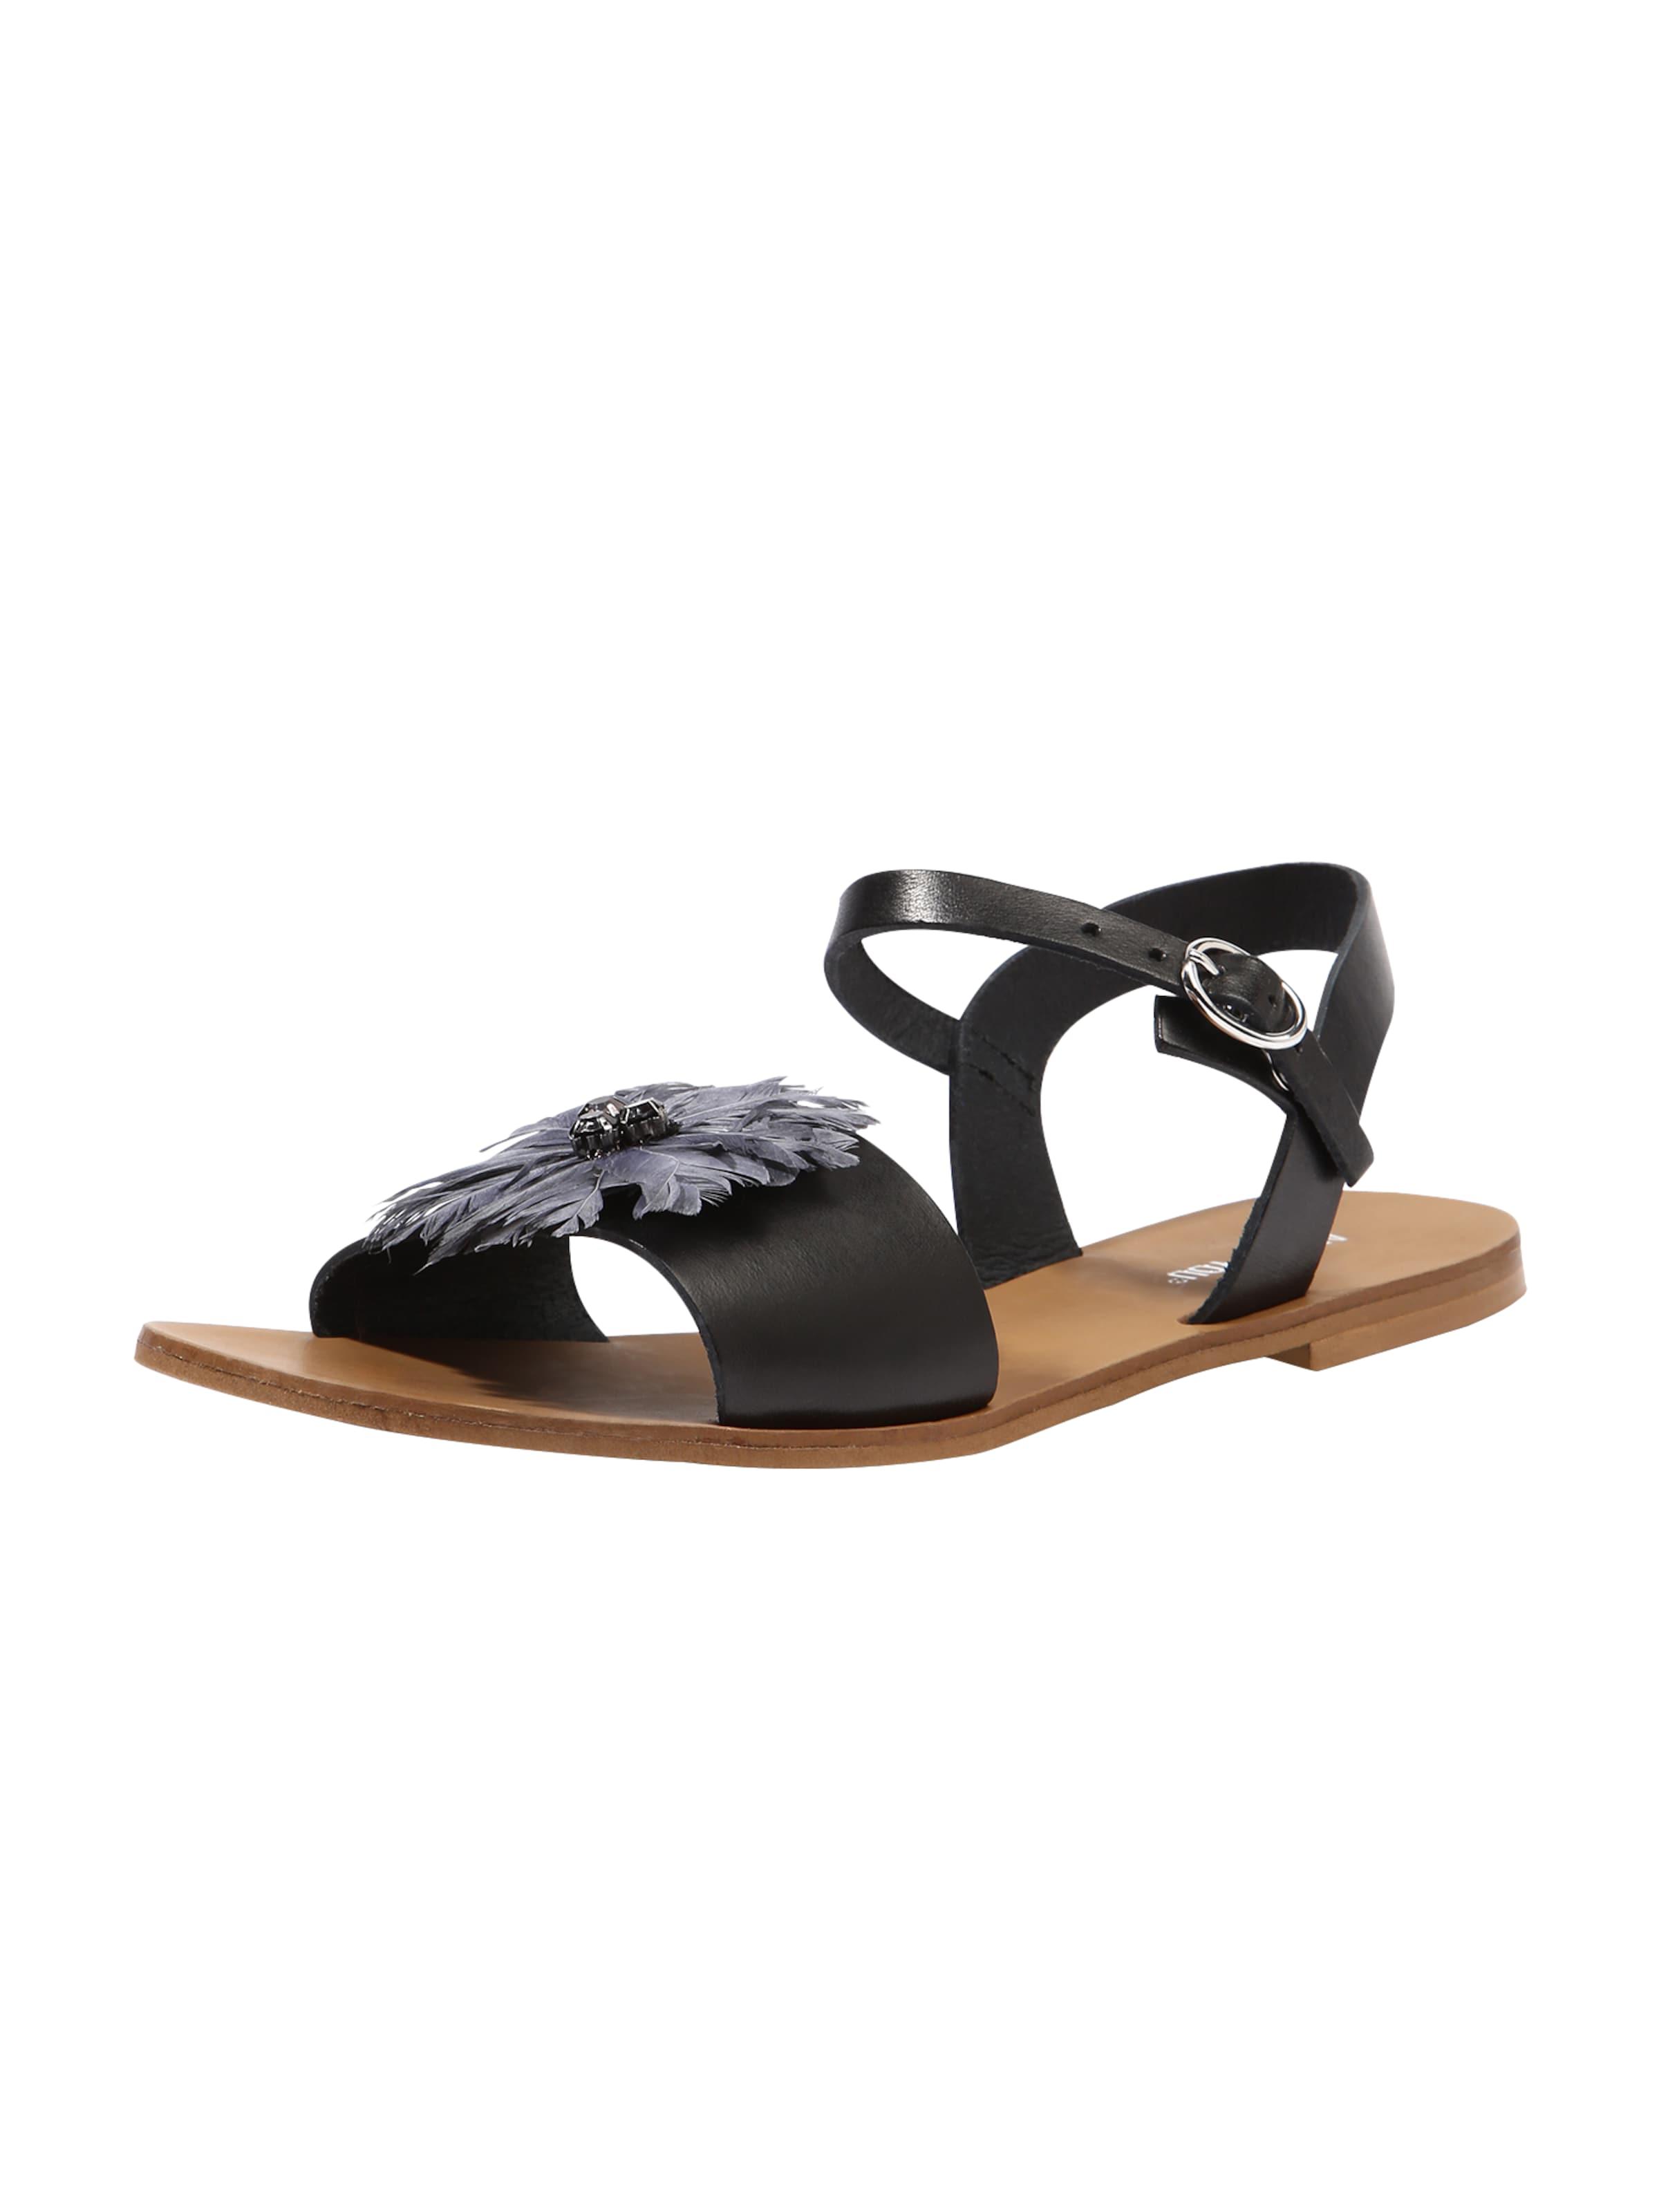 ABOUT YOU Schuhe Riemchensandalen TELA Verschleißfeste billige Schuhe YOU 0e5139